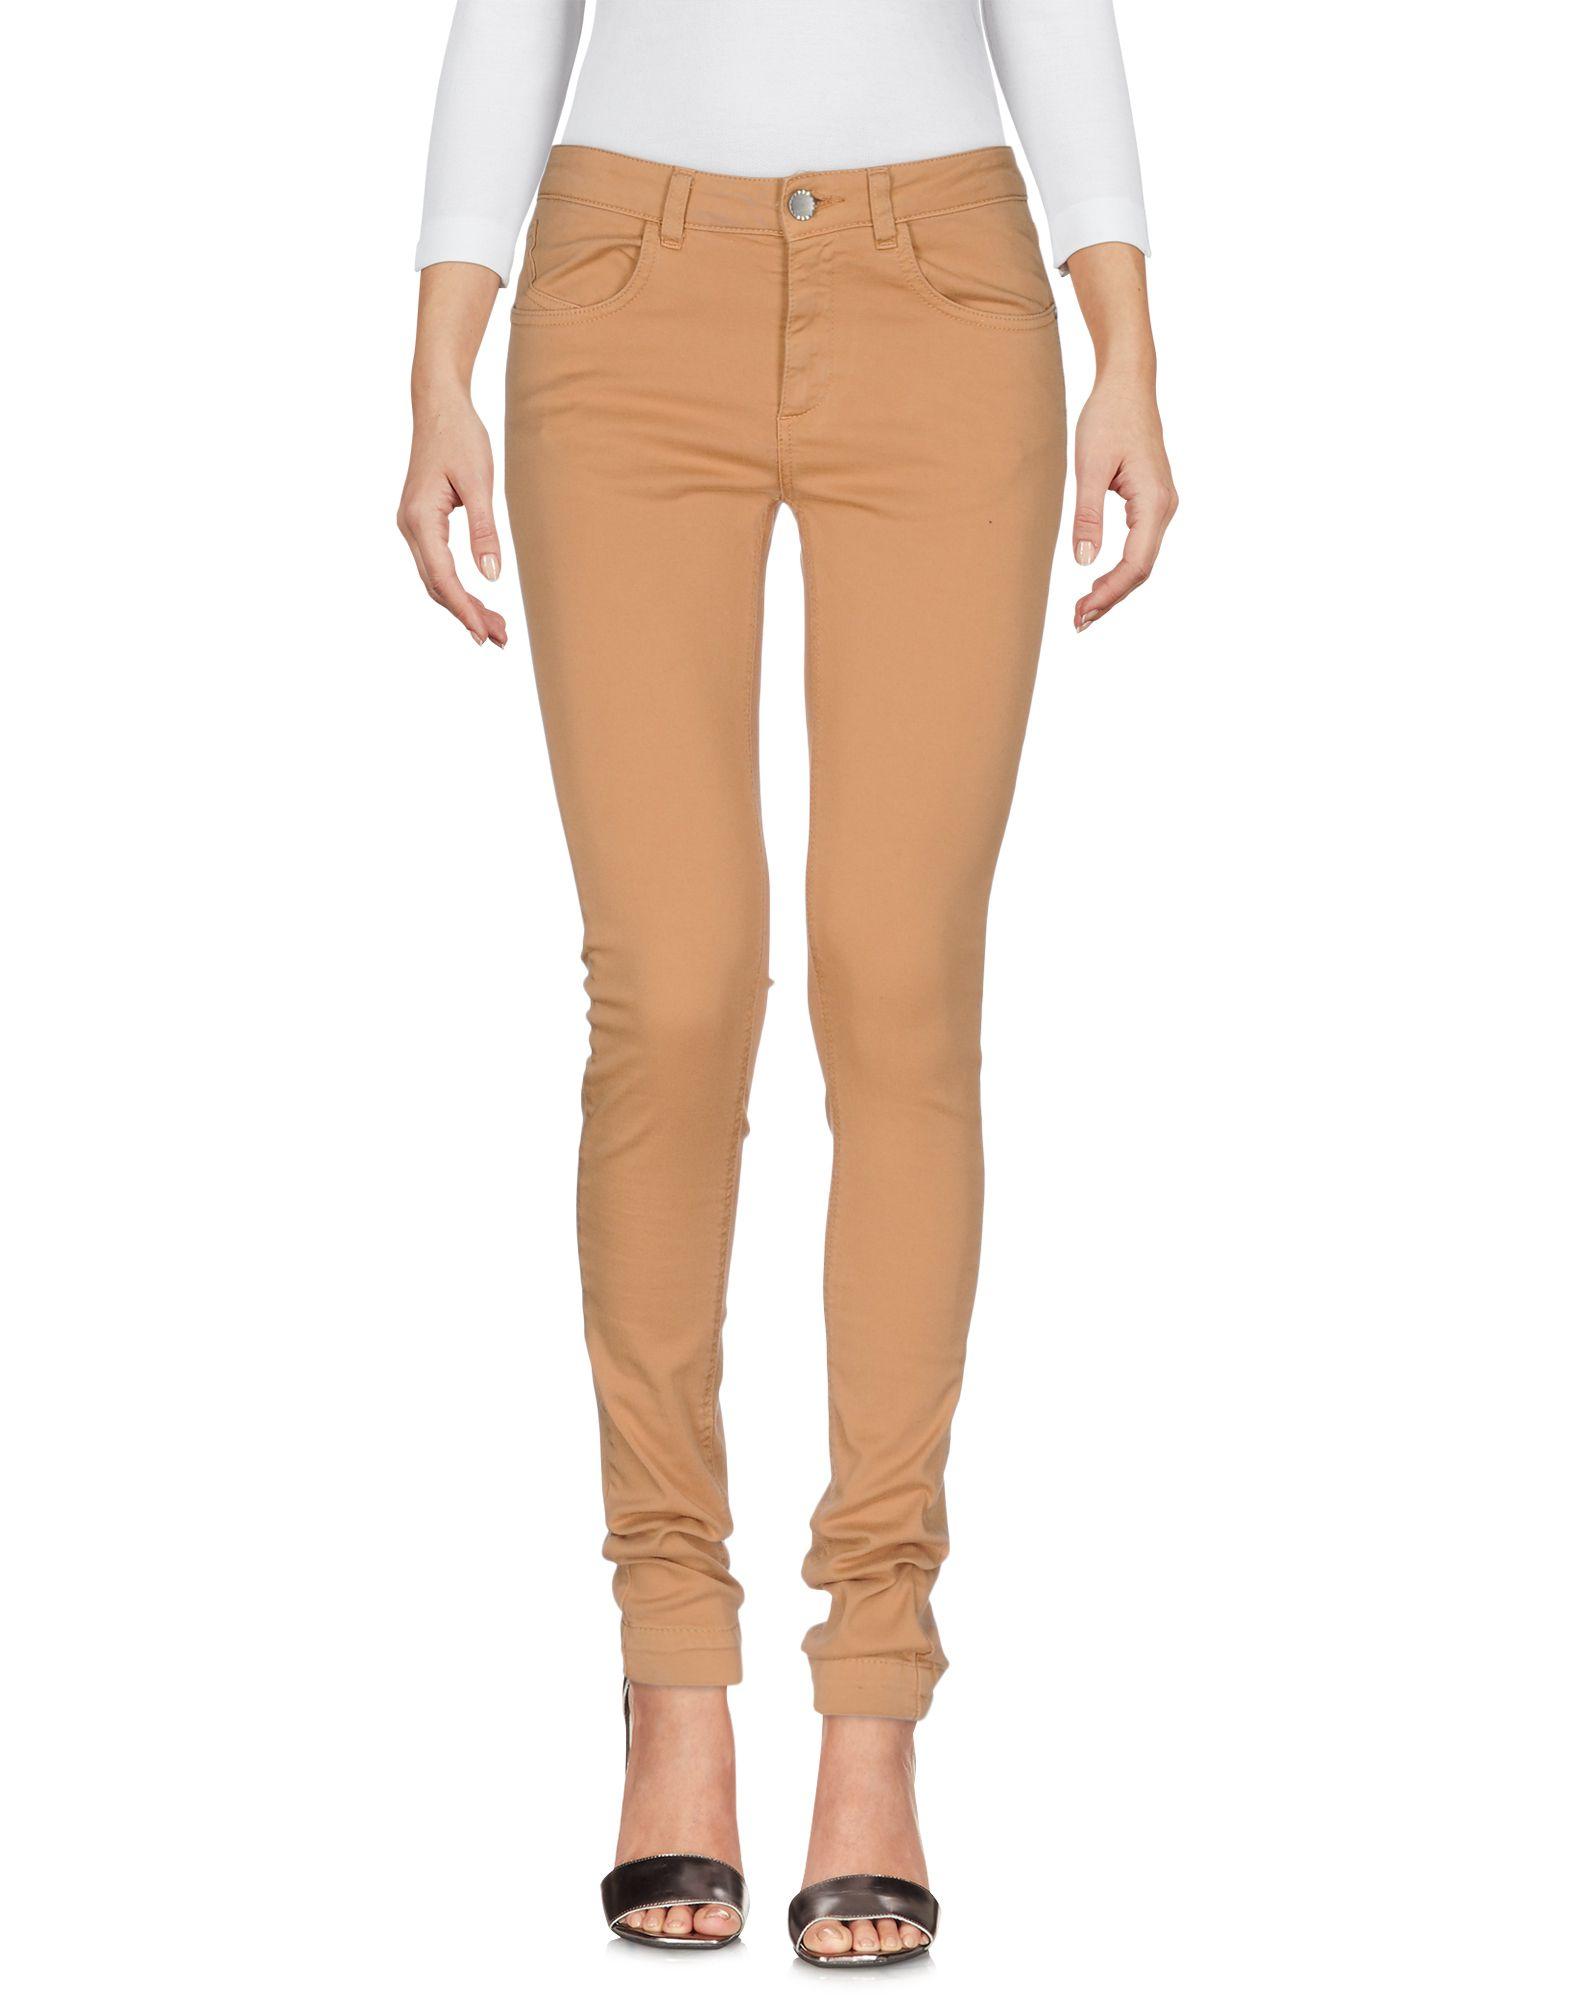 'Twin-set Simona Barbieri Casual Pants